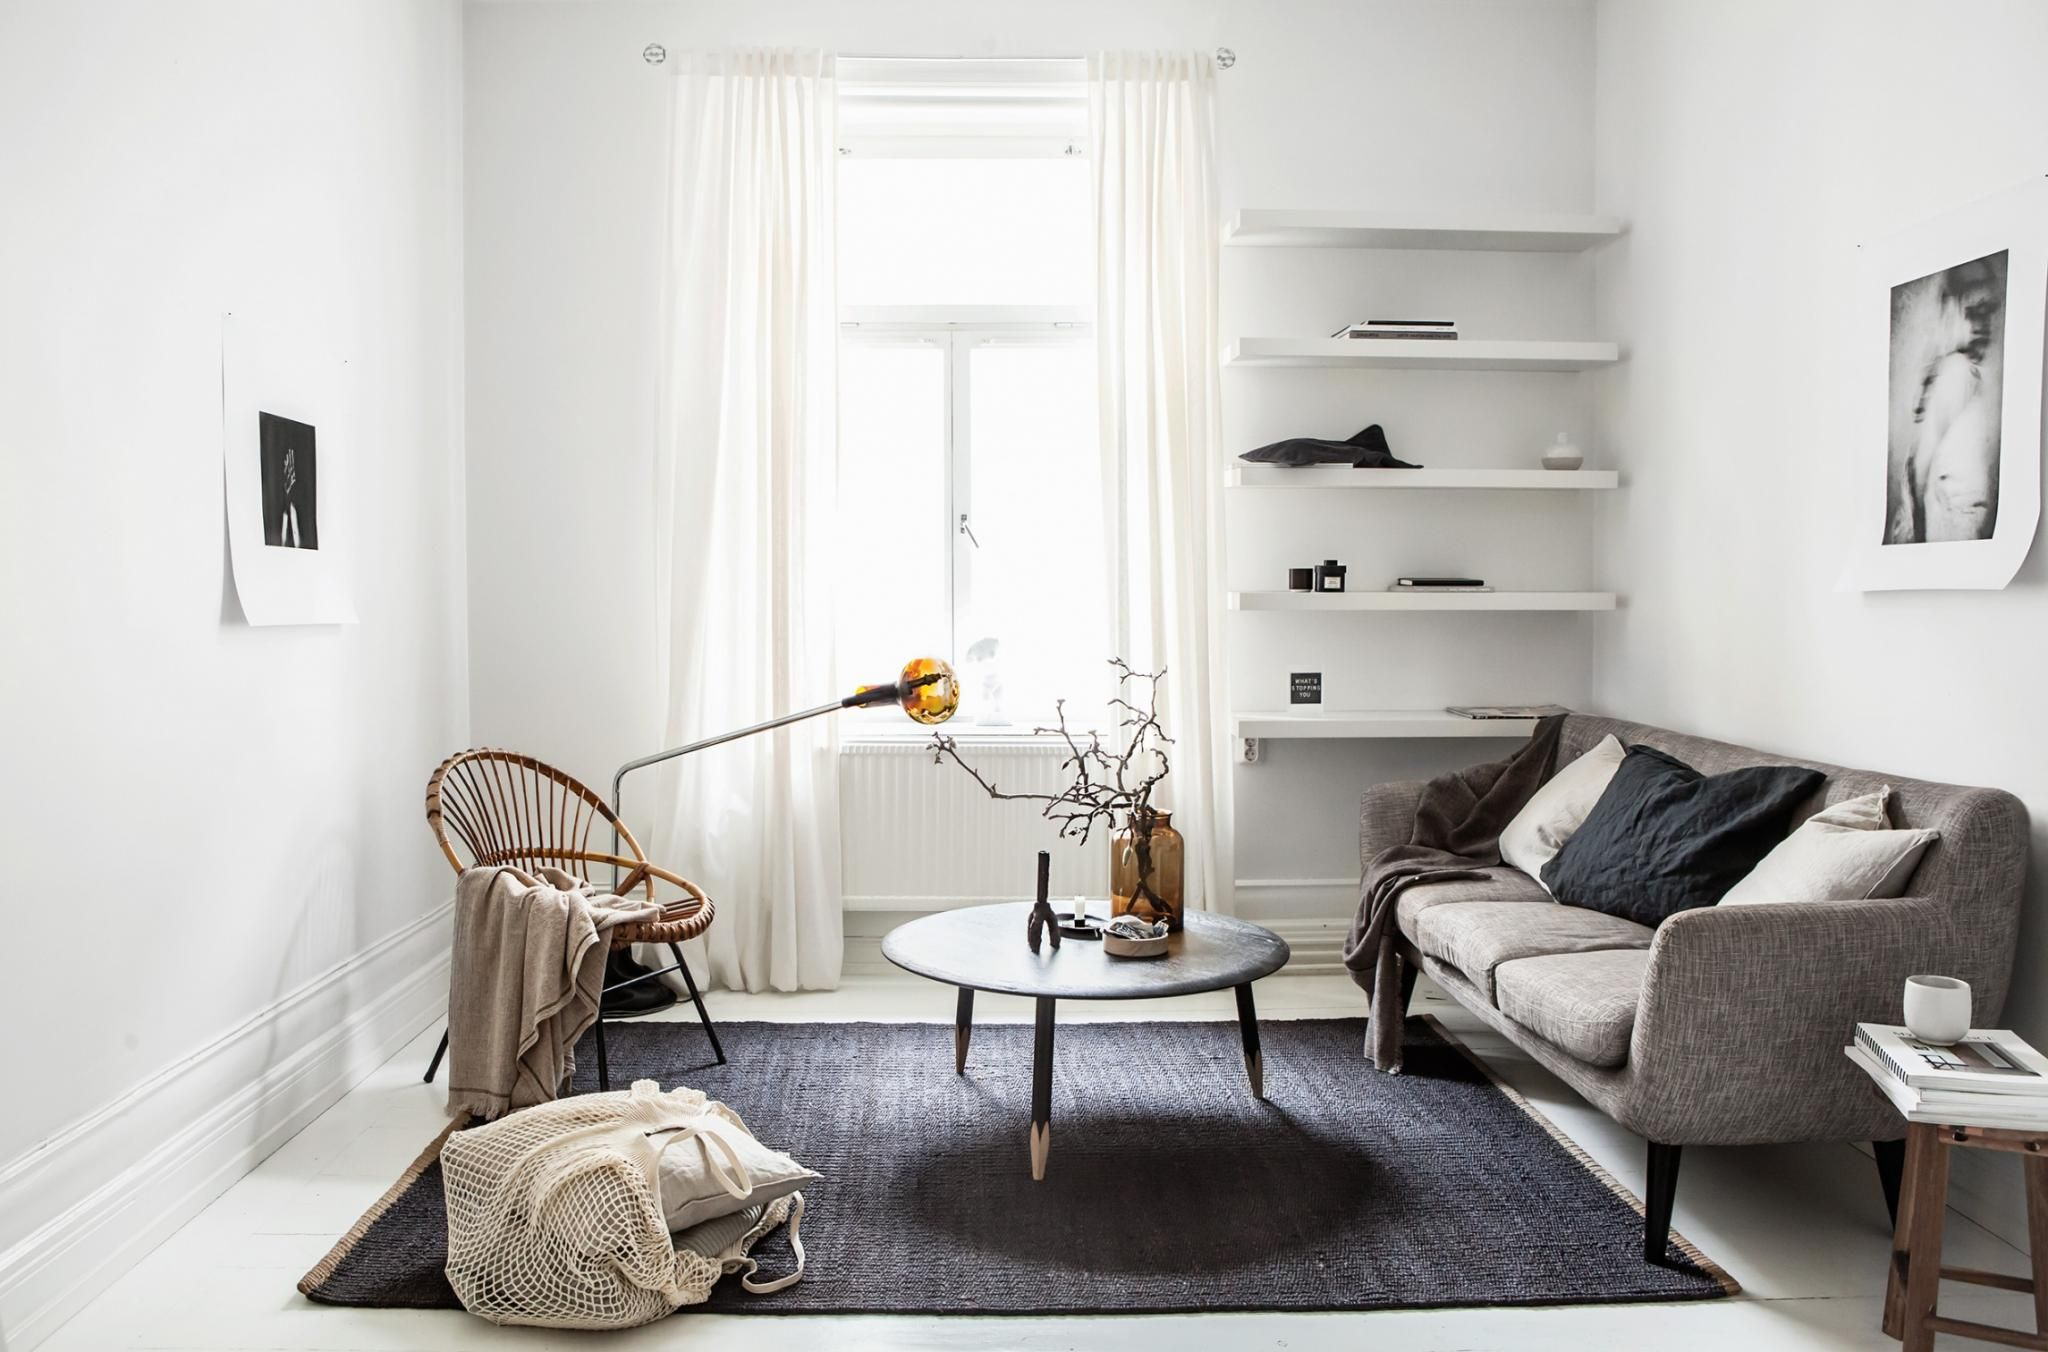 Woonkamer Klein Appartement : Zo richt je een klein appartement in van m woonkamer